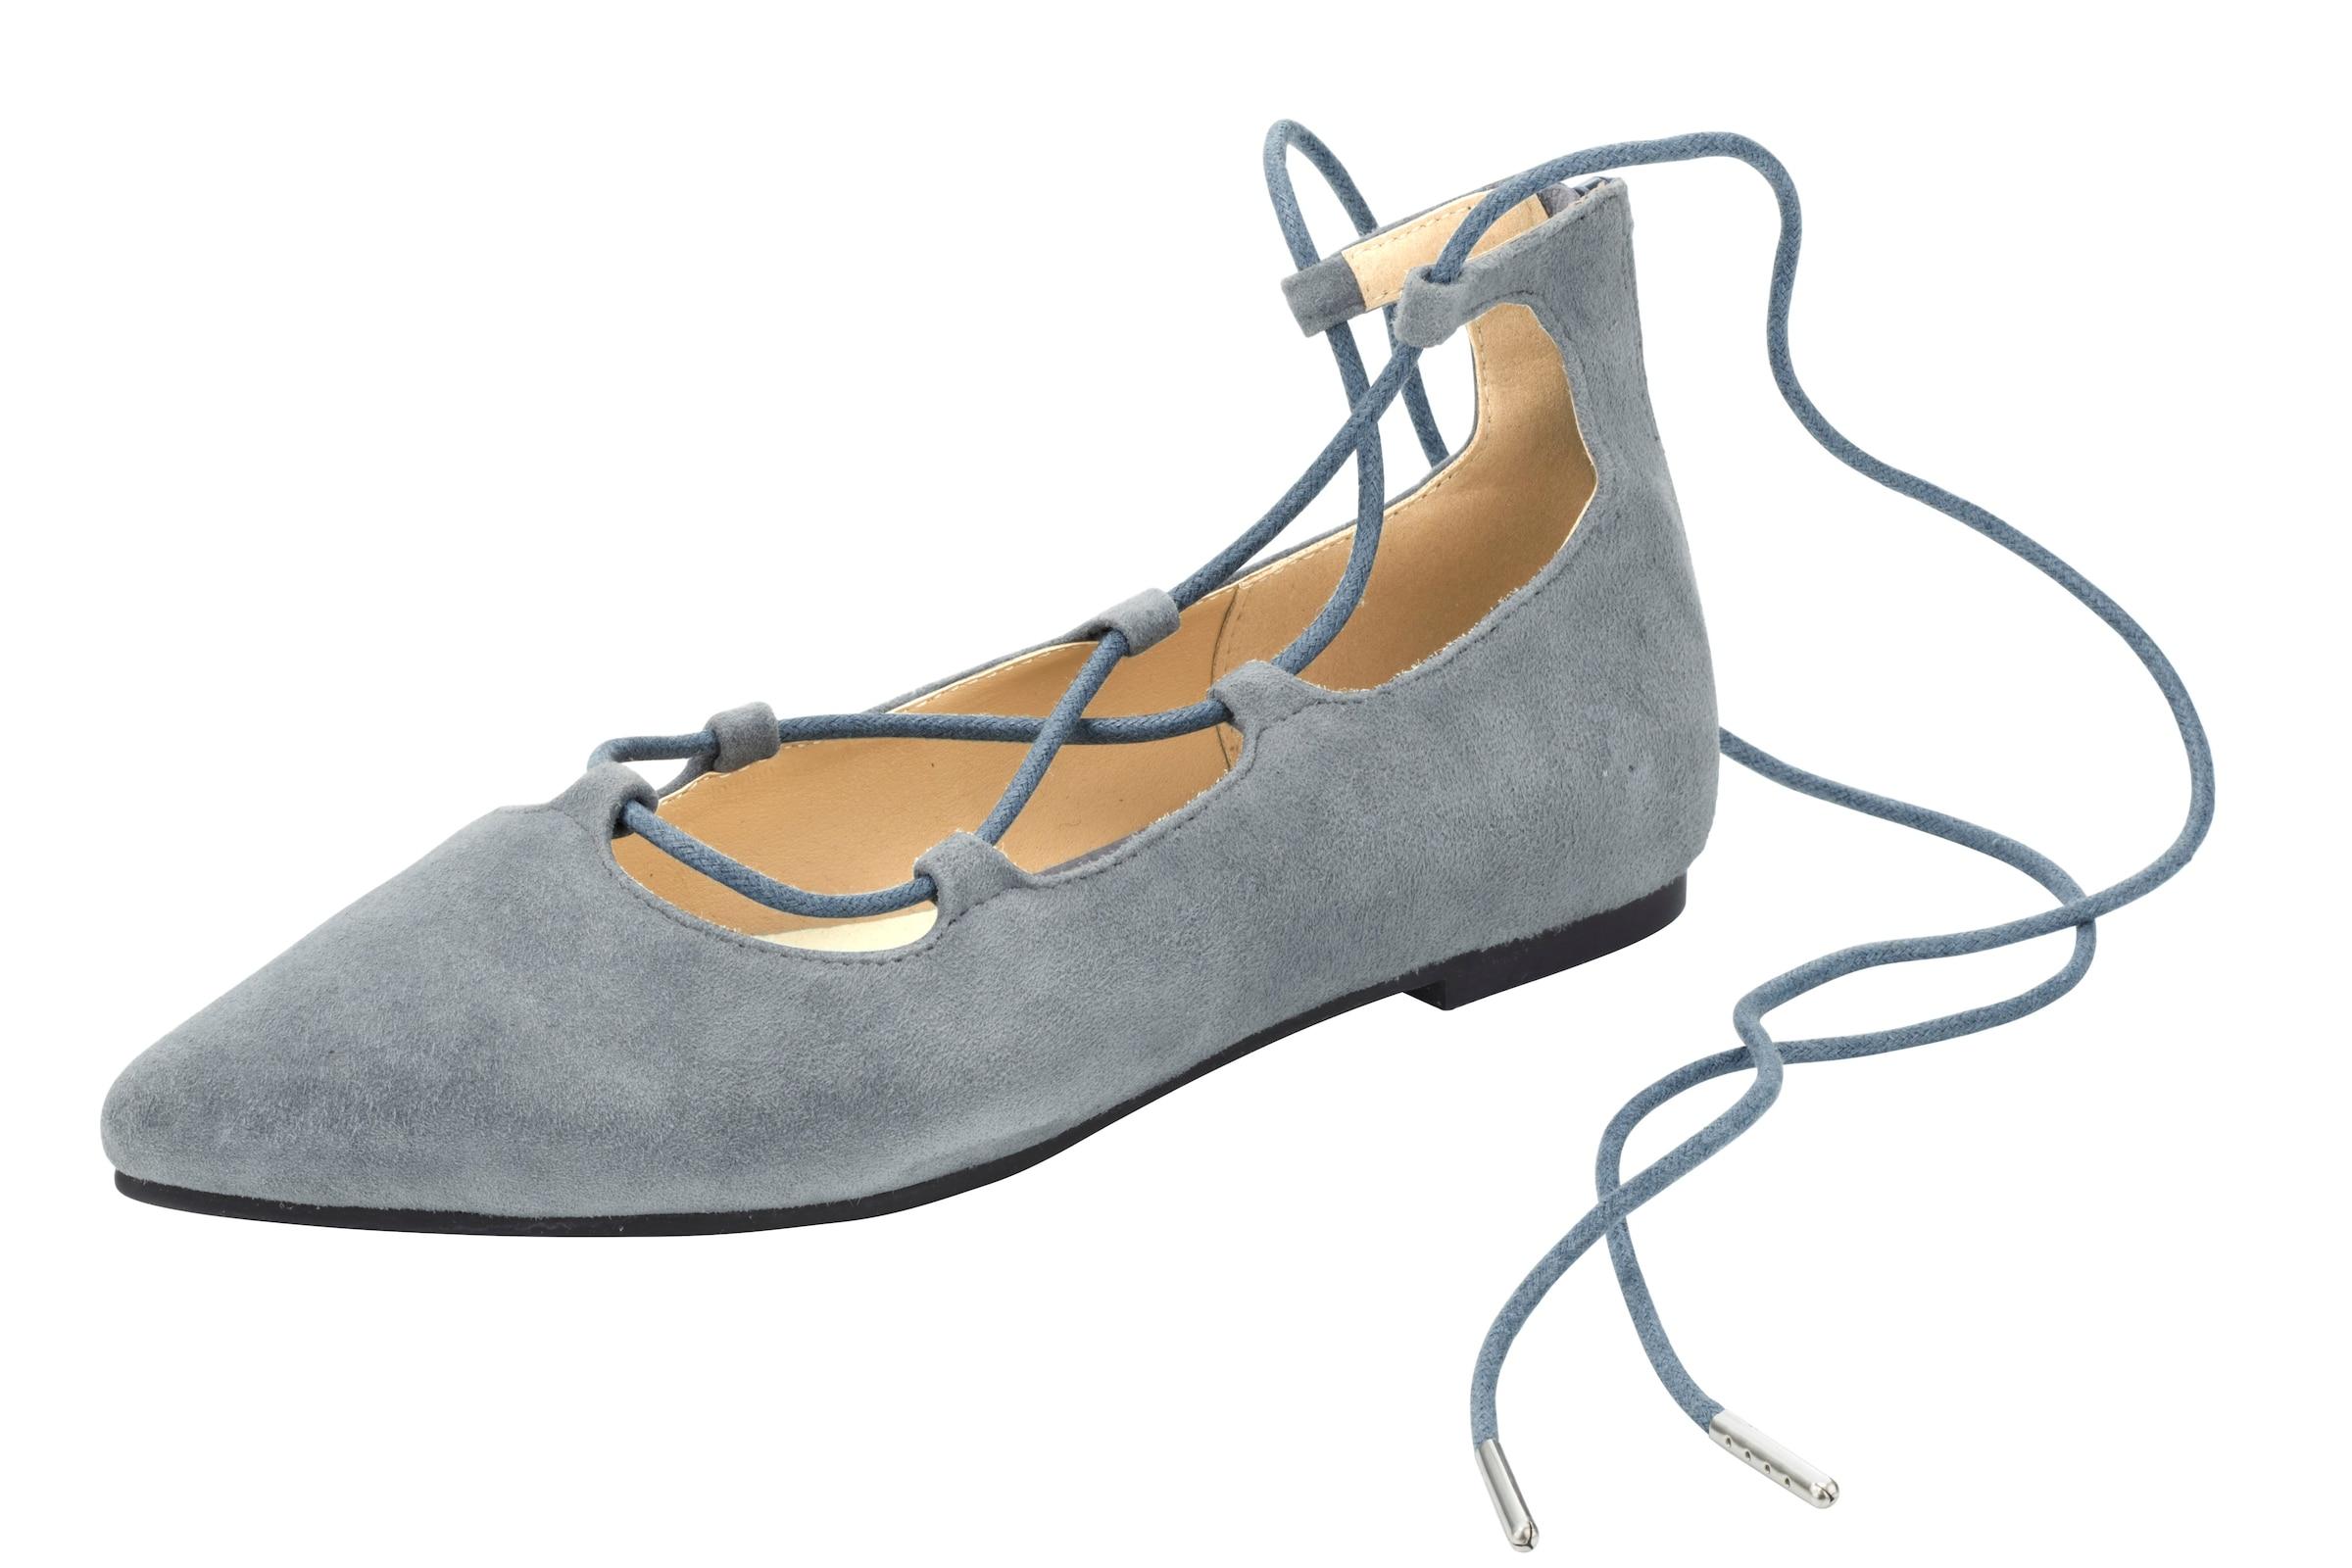 ANDREA CONTI Ballerina Günstige und langlebige Schuhe